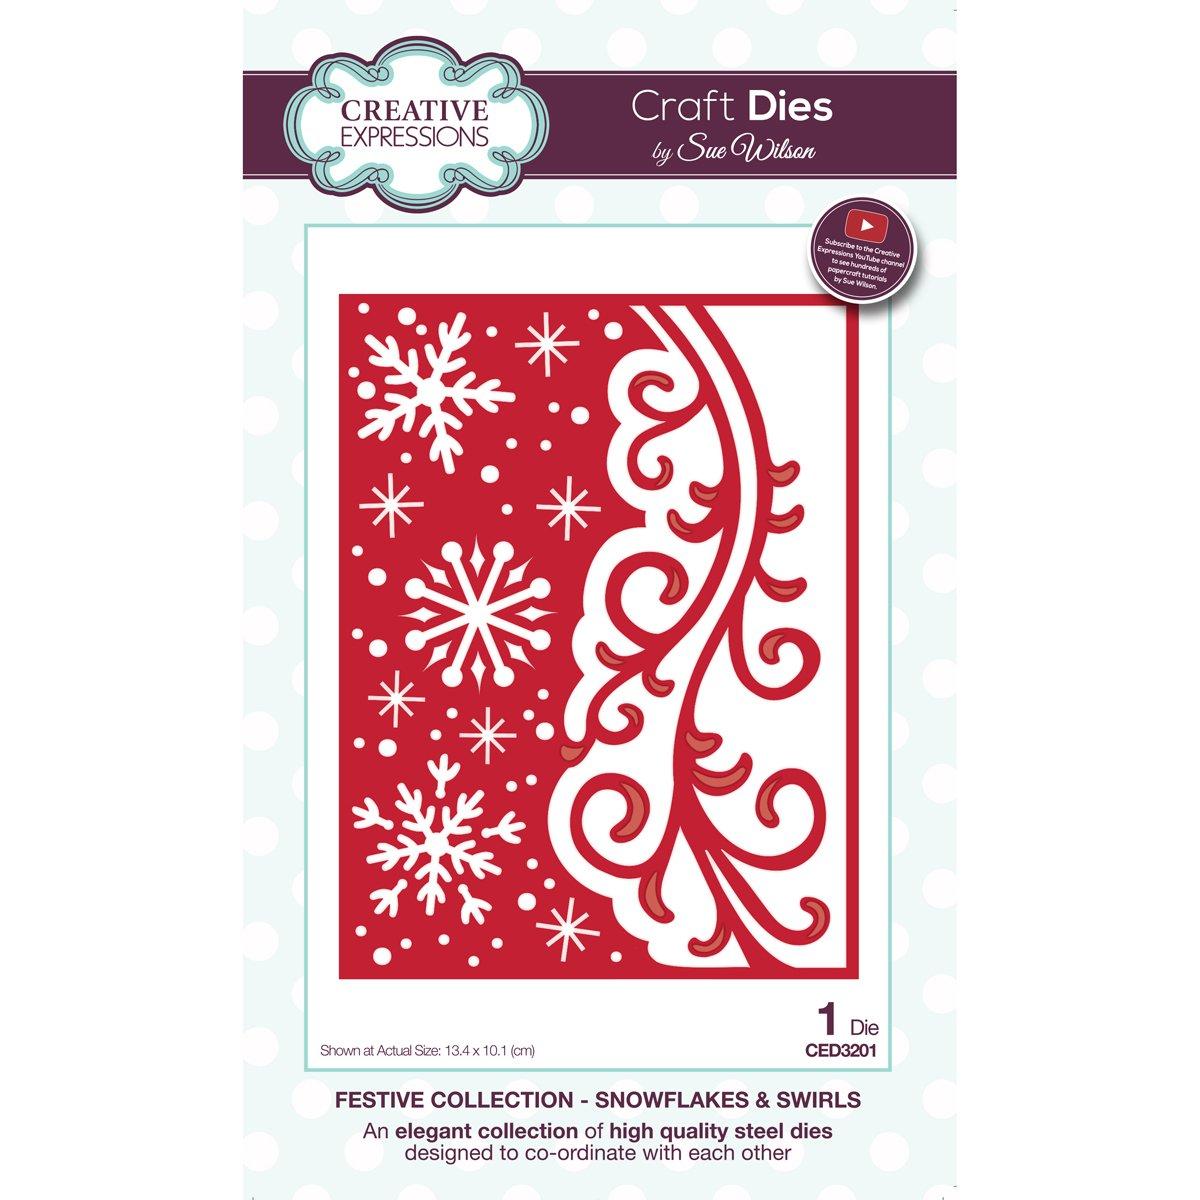 CE CED3201 Snowflakes & swirls